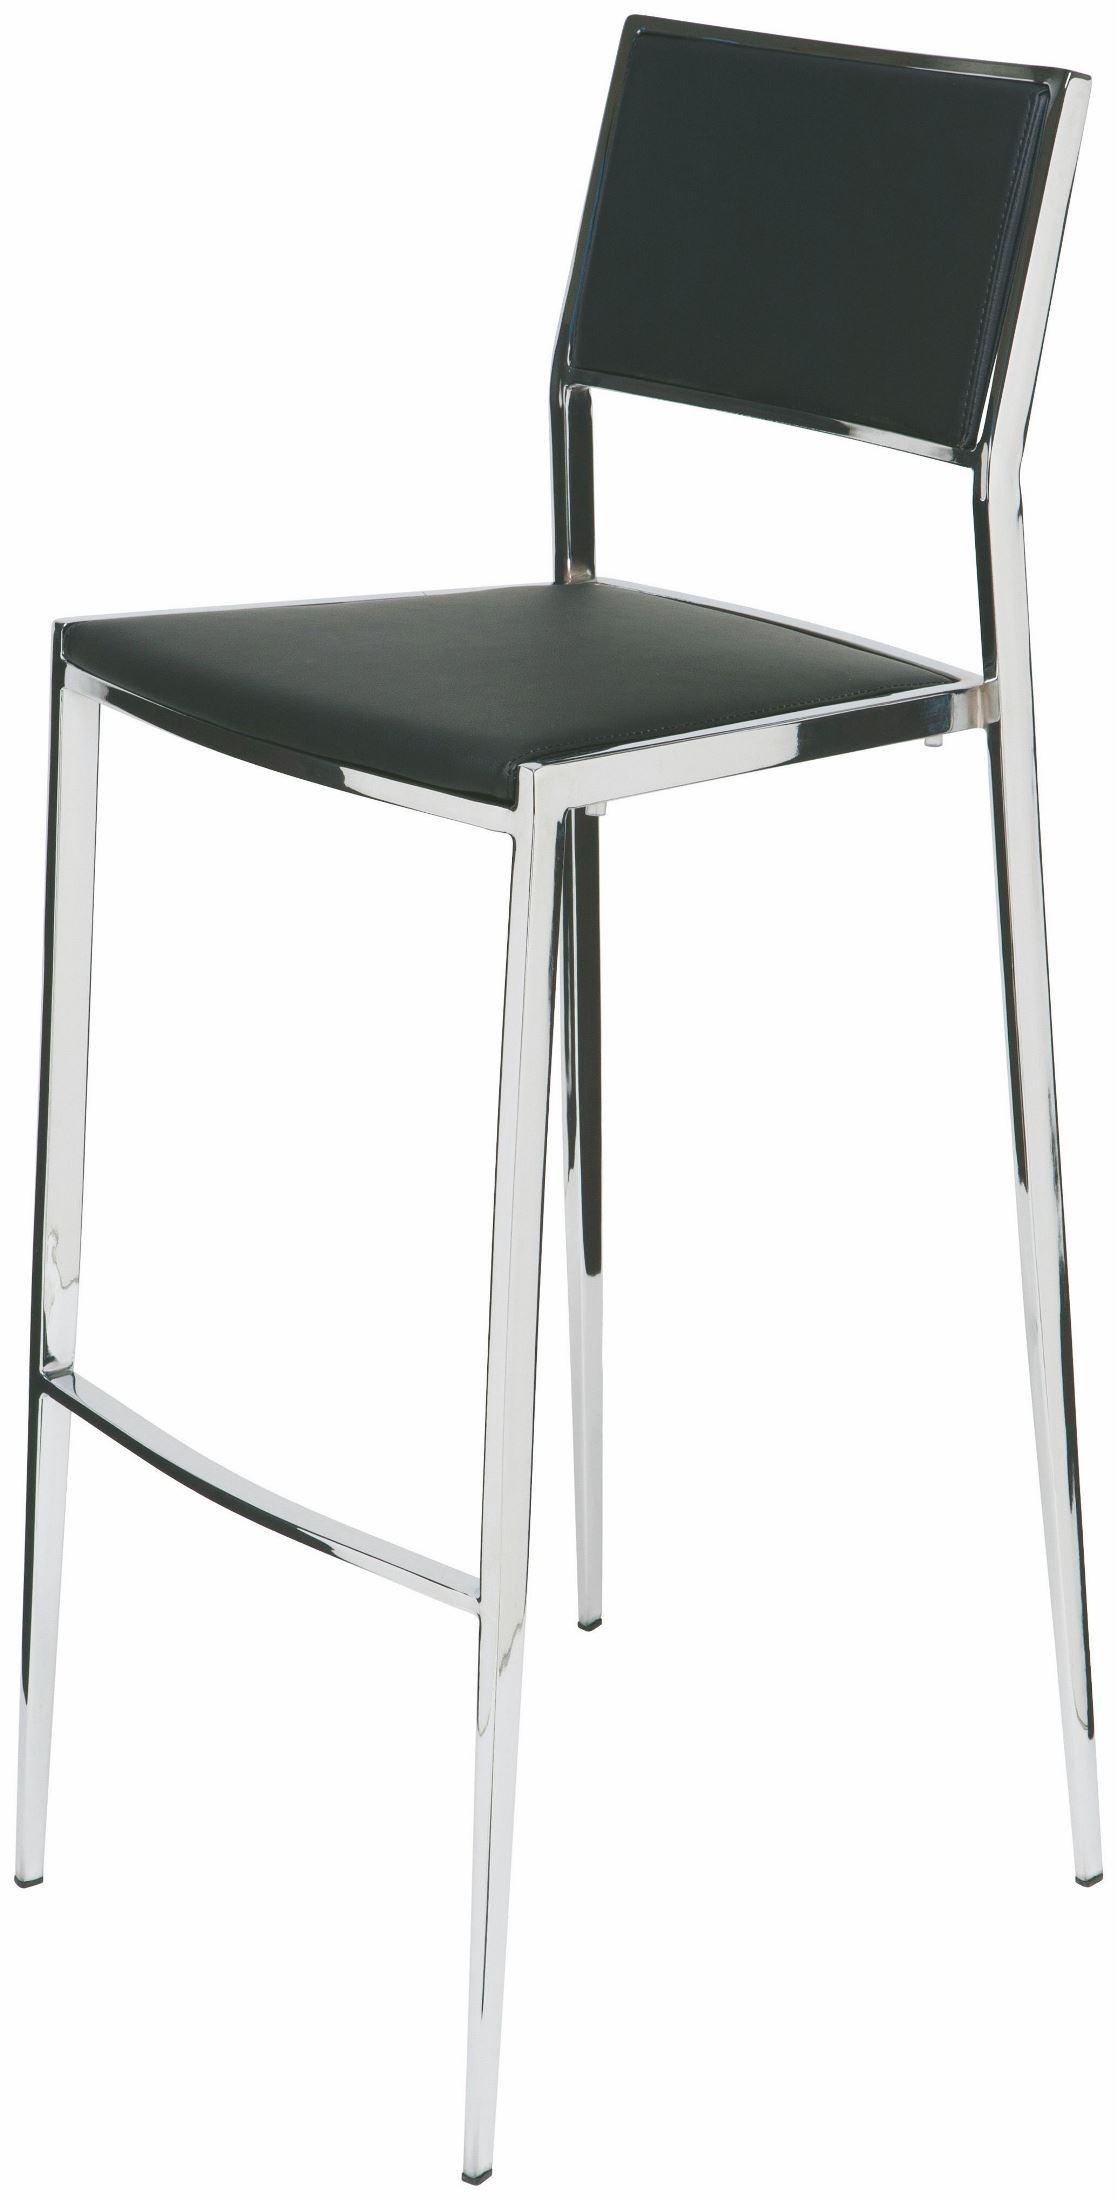 Aaron Black Naugahyde Bar Stool From Nuevo Coleman Furniture